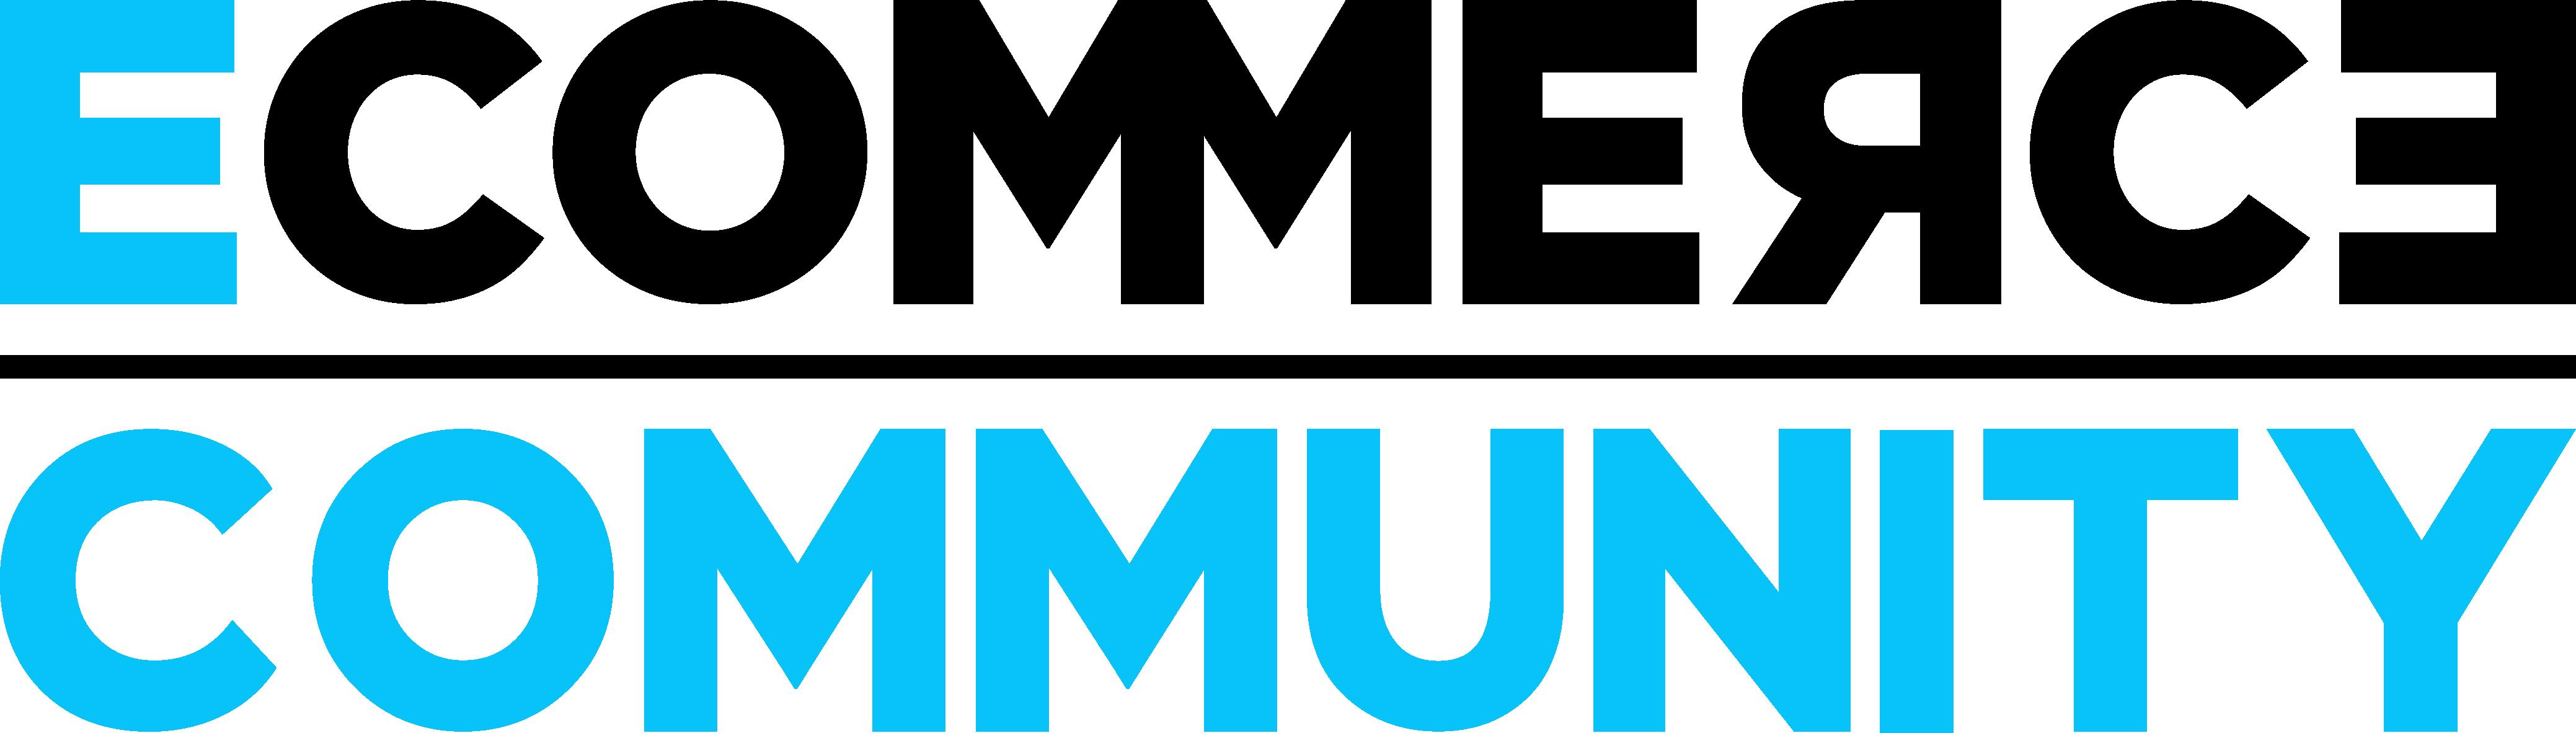 EcommerceCommunity - Formazione Ecommerce